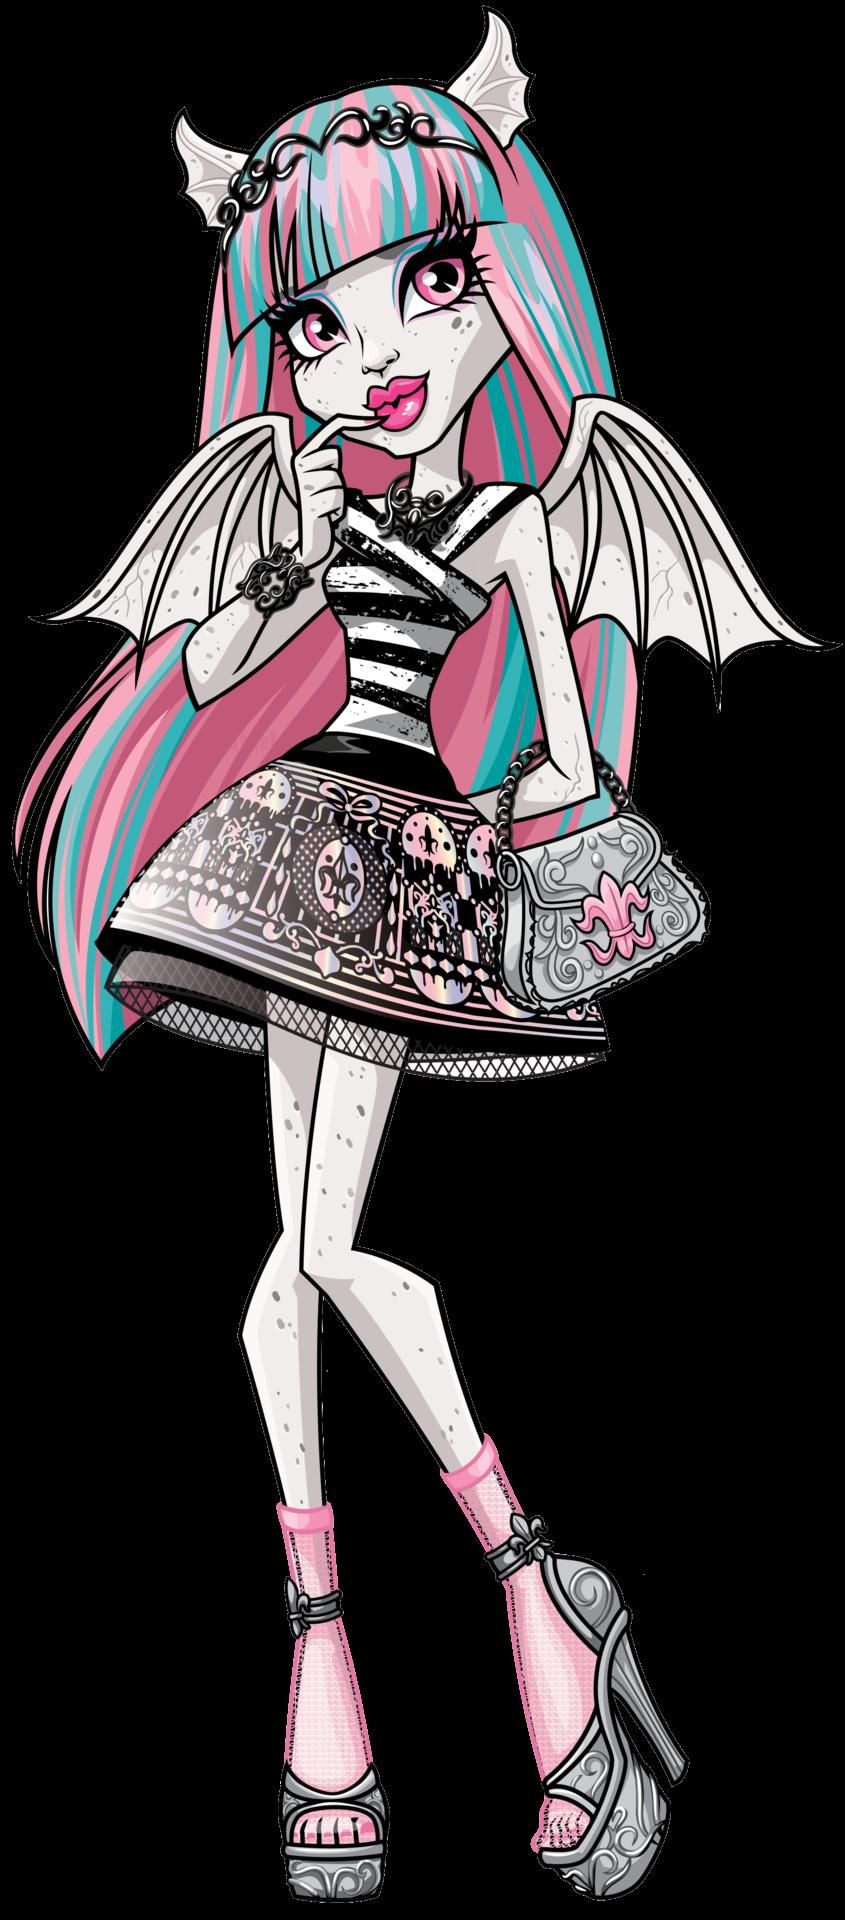 Uncategorized Monster High Gargoyle rochelle goyle monster high wiki fandom powered by wikia goyle